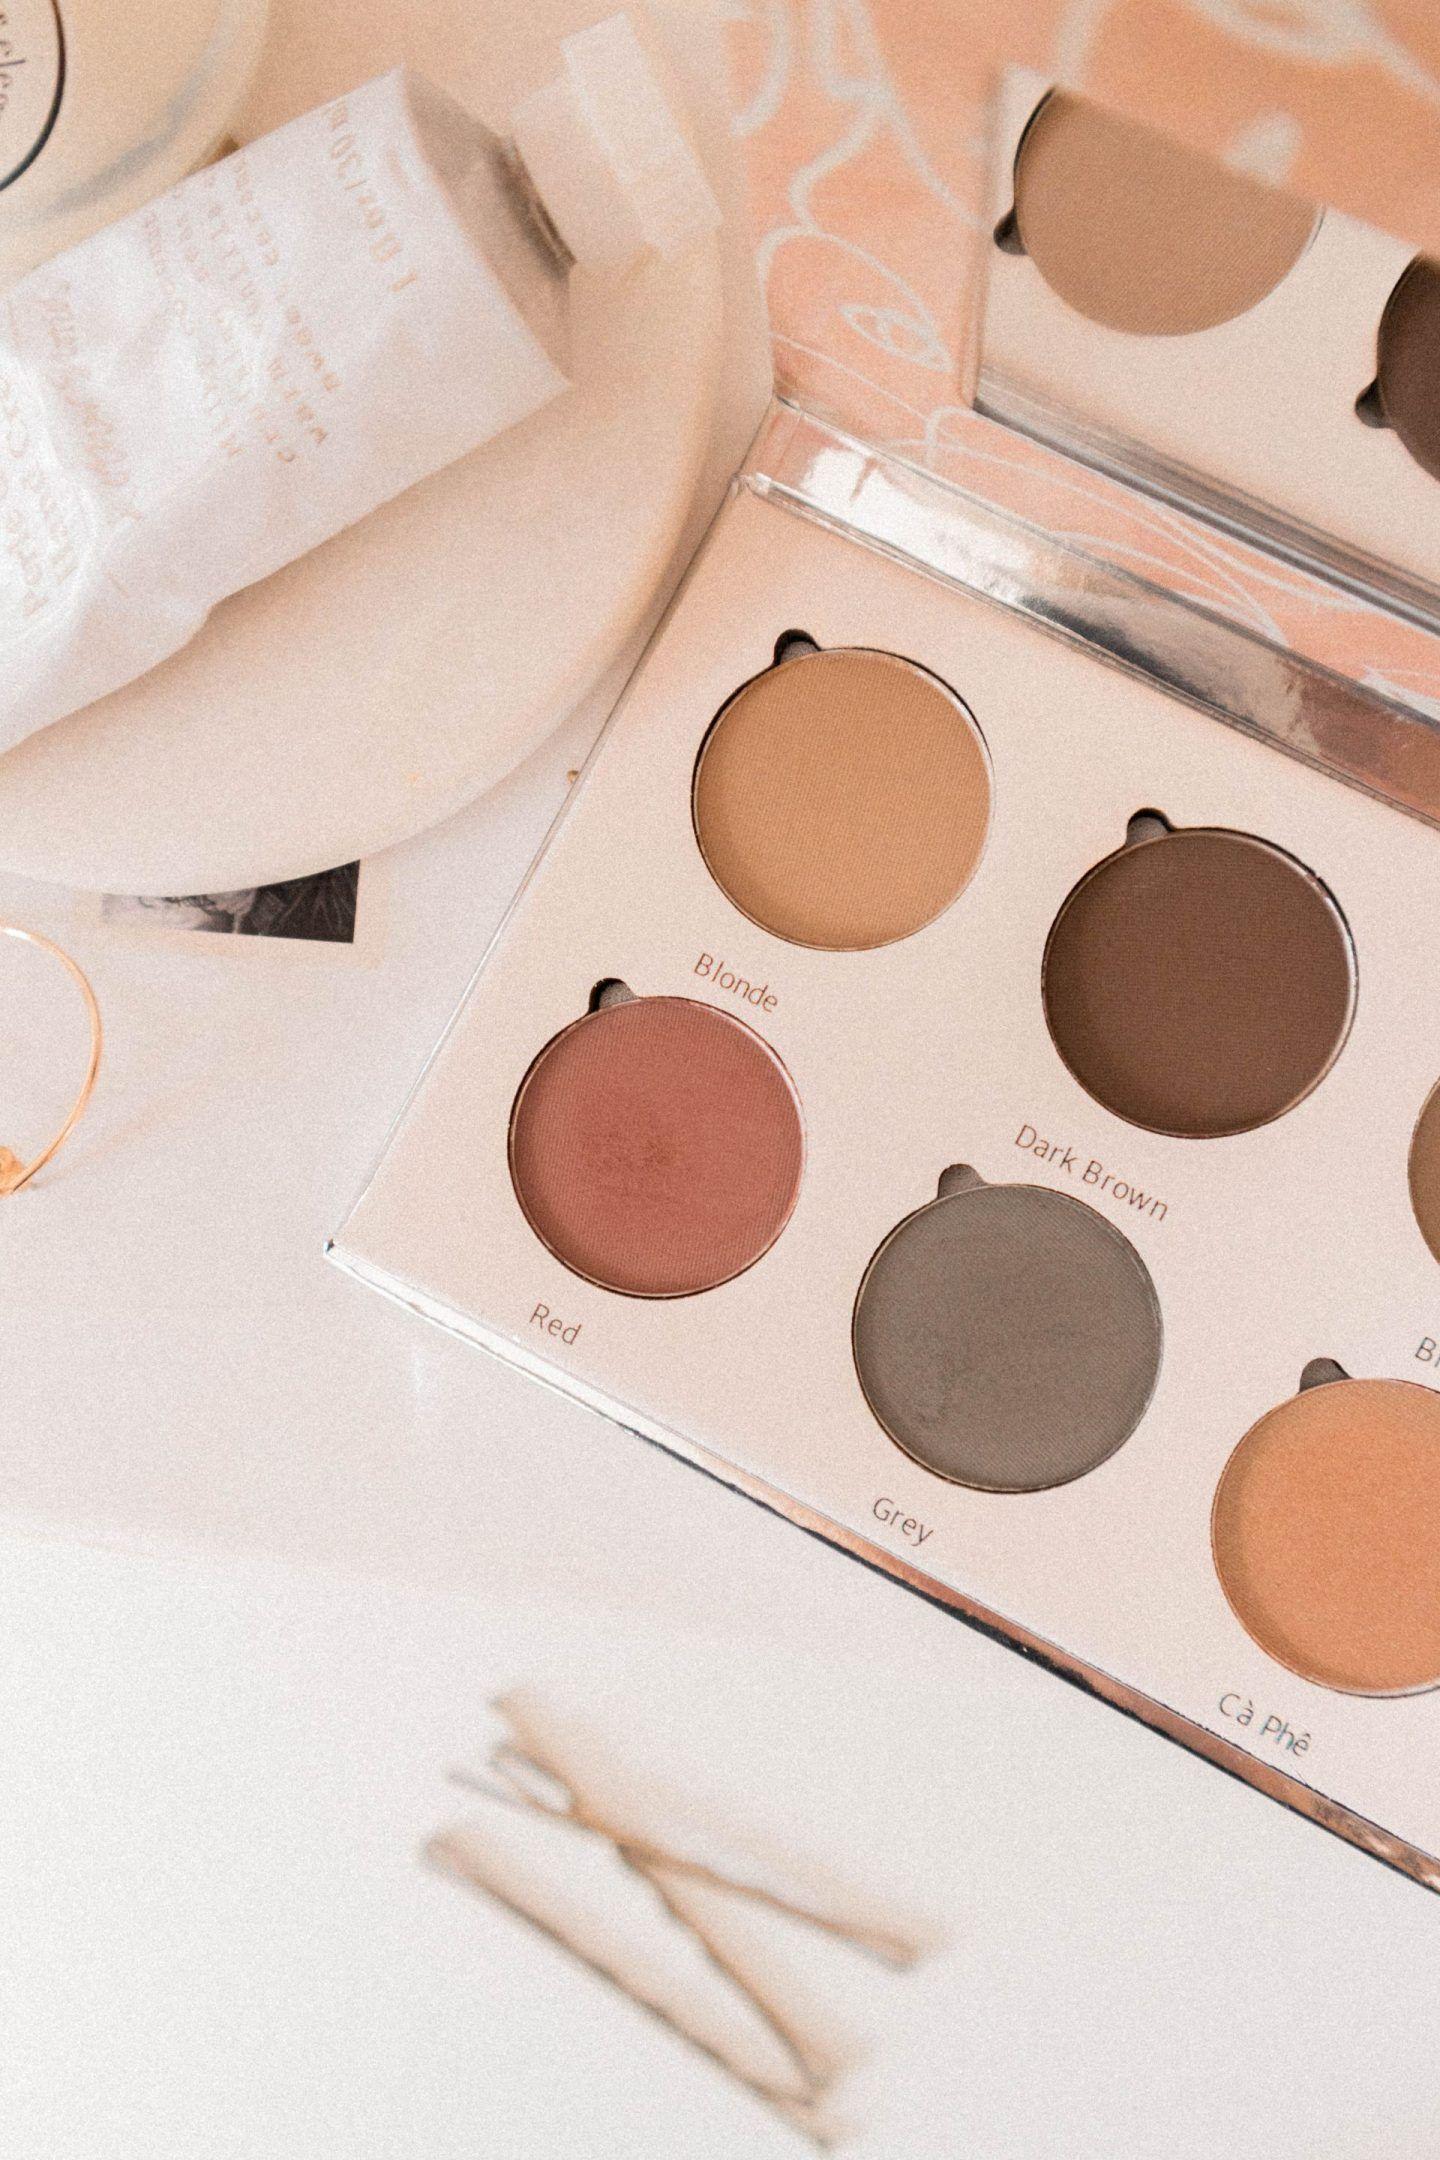 Creating My Perfect Eyeshadow Palette. Madi Williams